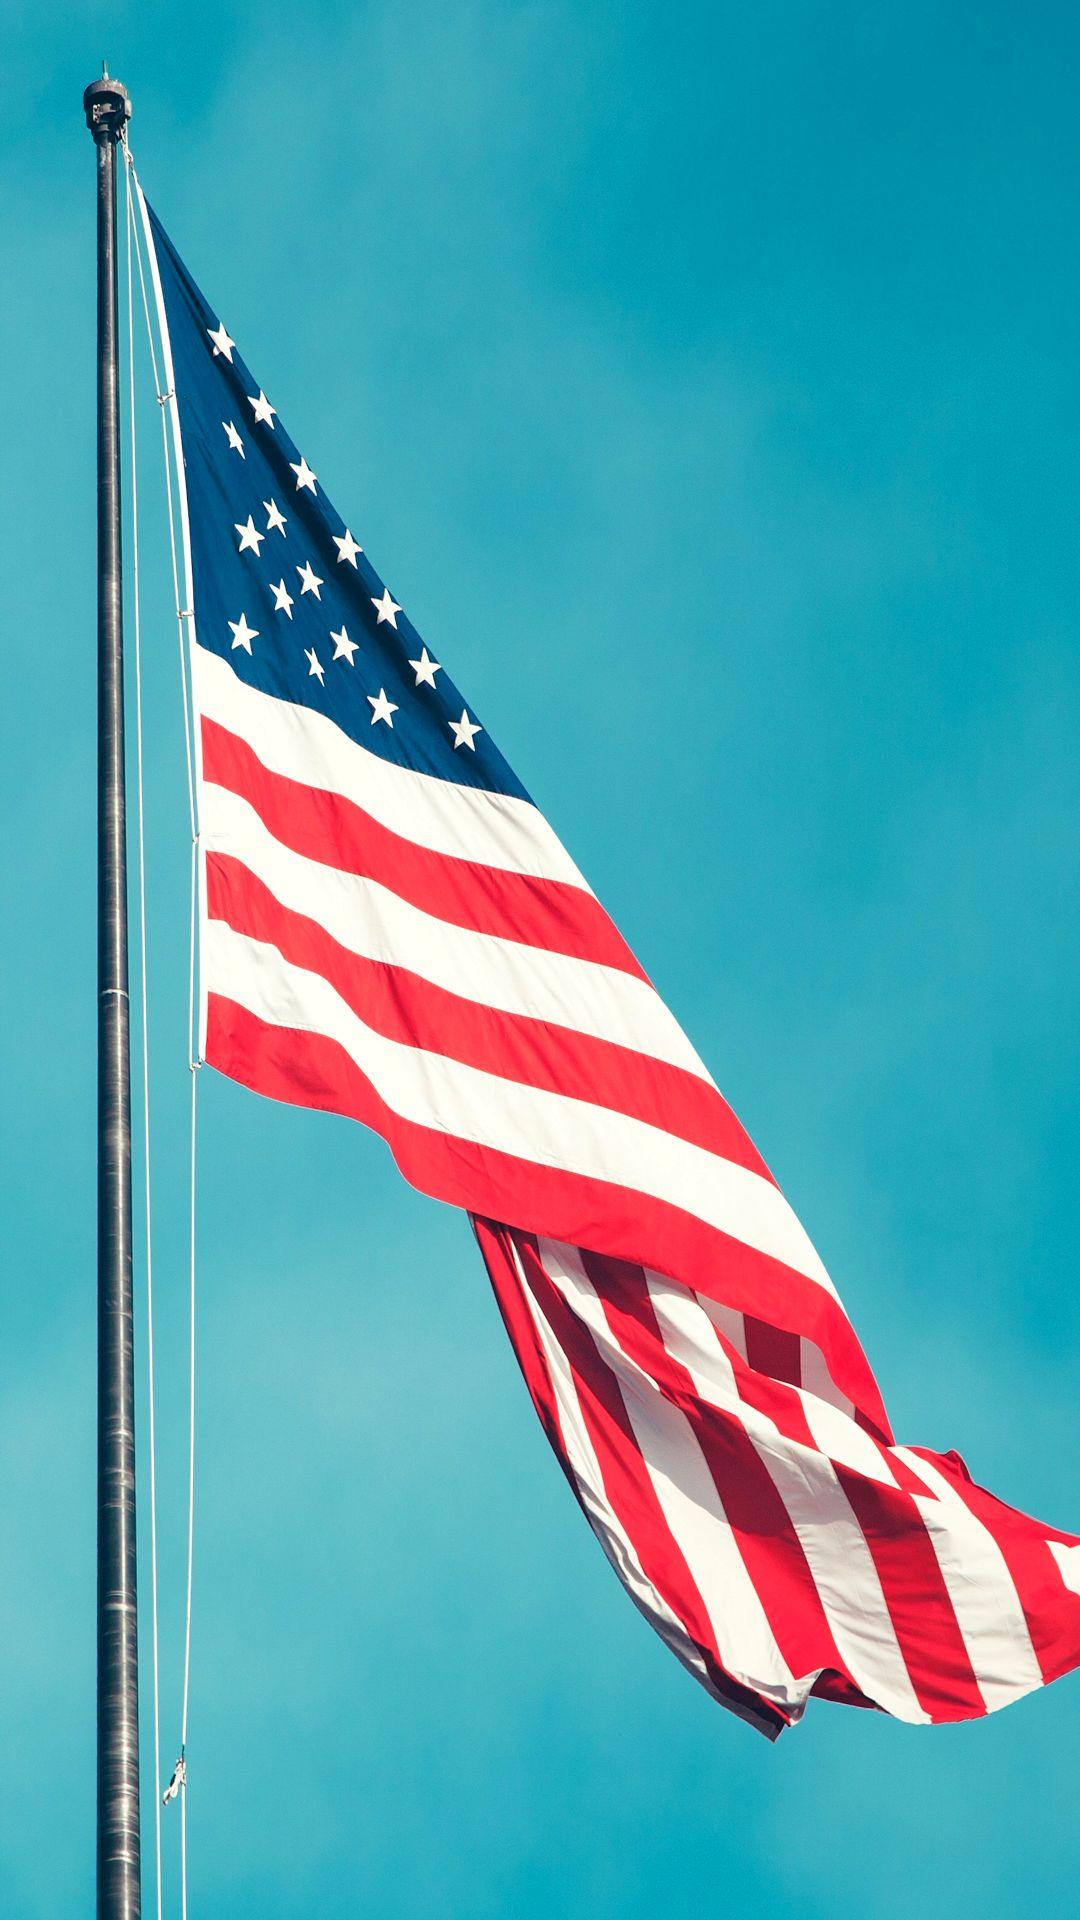 American Flag Iphone Background : american, iphone, background, American, Iphone, Wallpaper2, Wallpaper, 1080x1920, Download, WallpaperTip